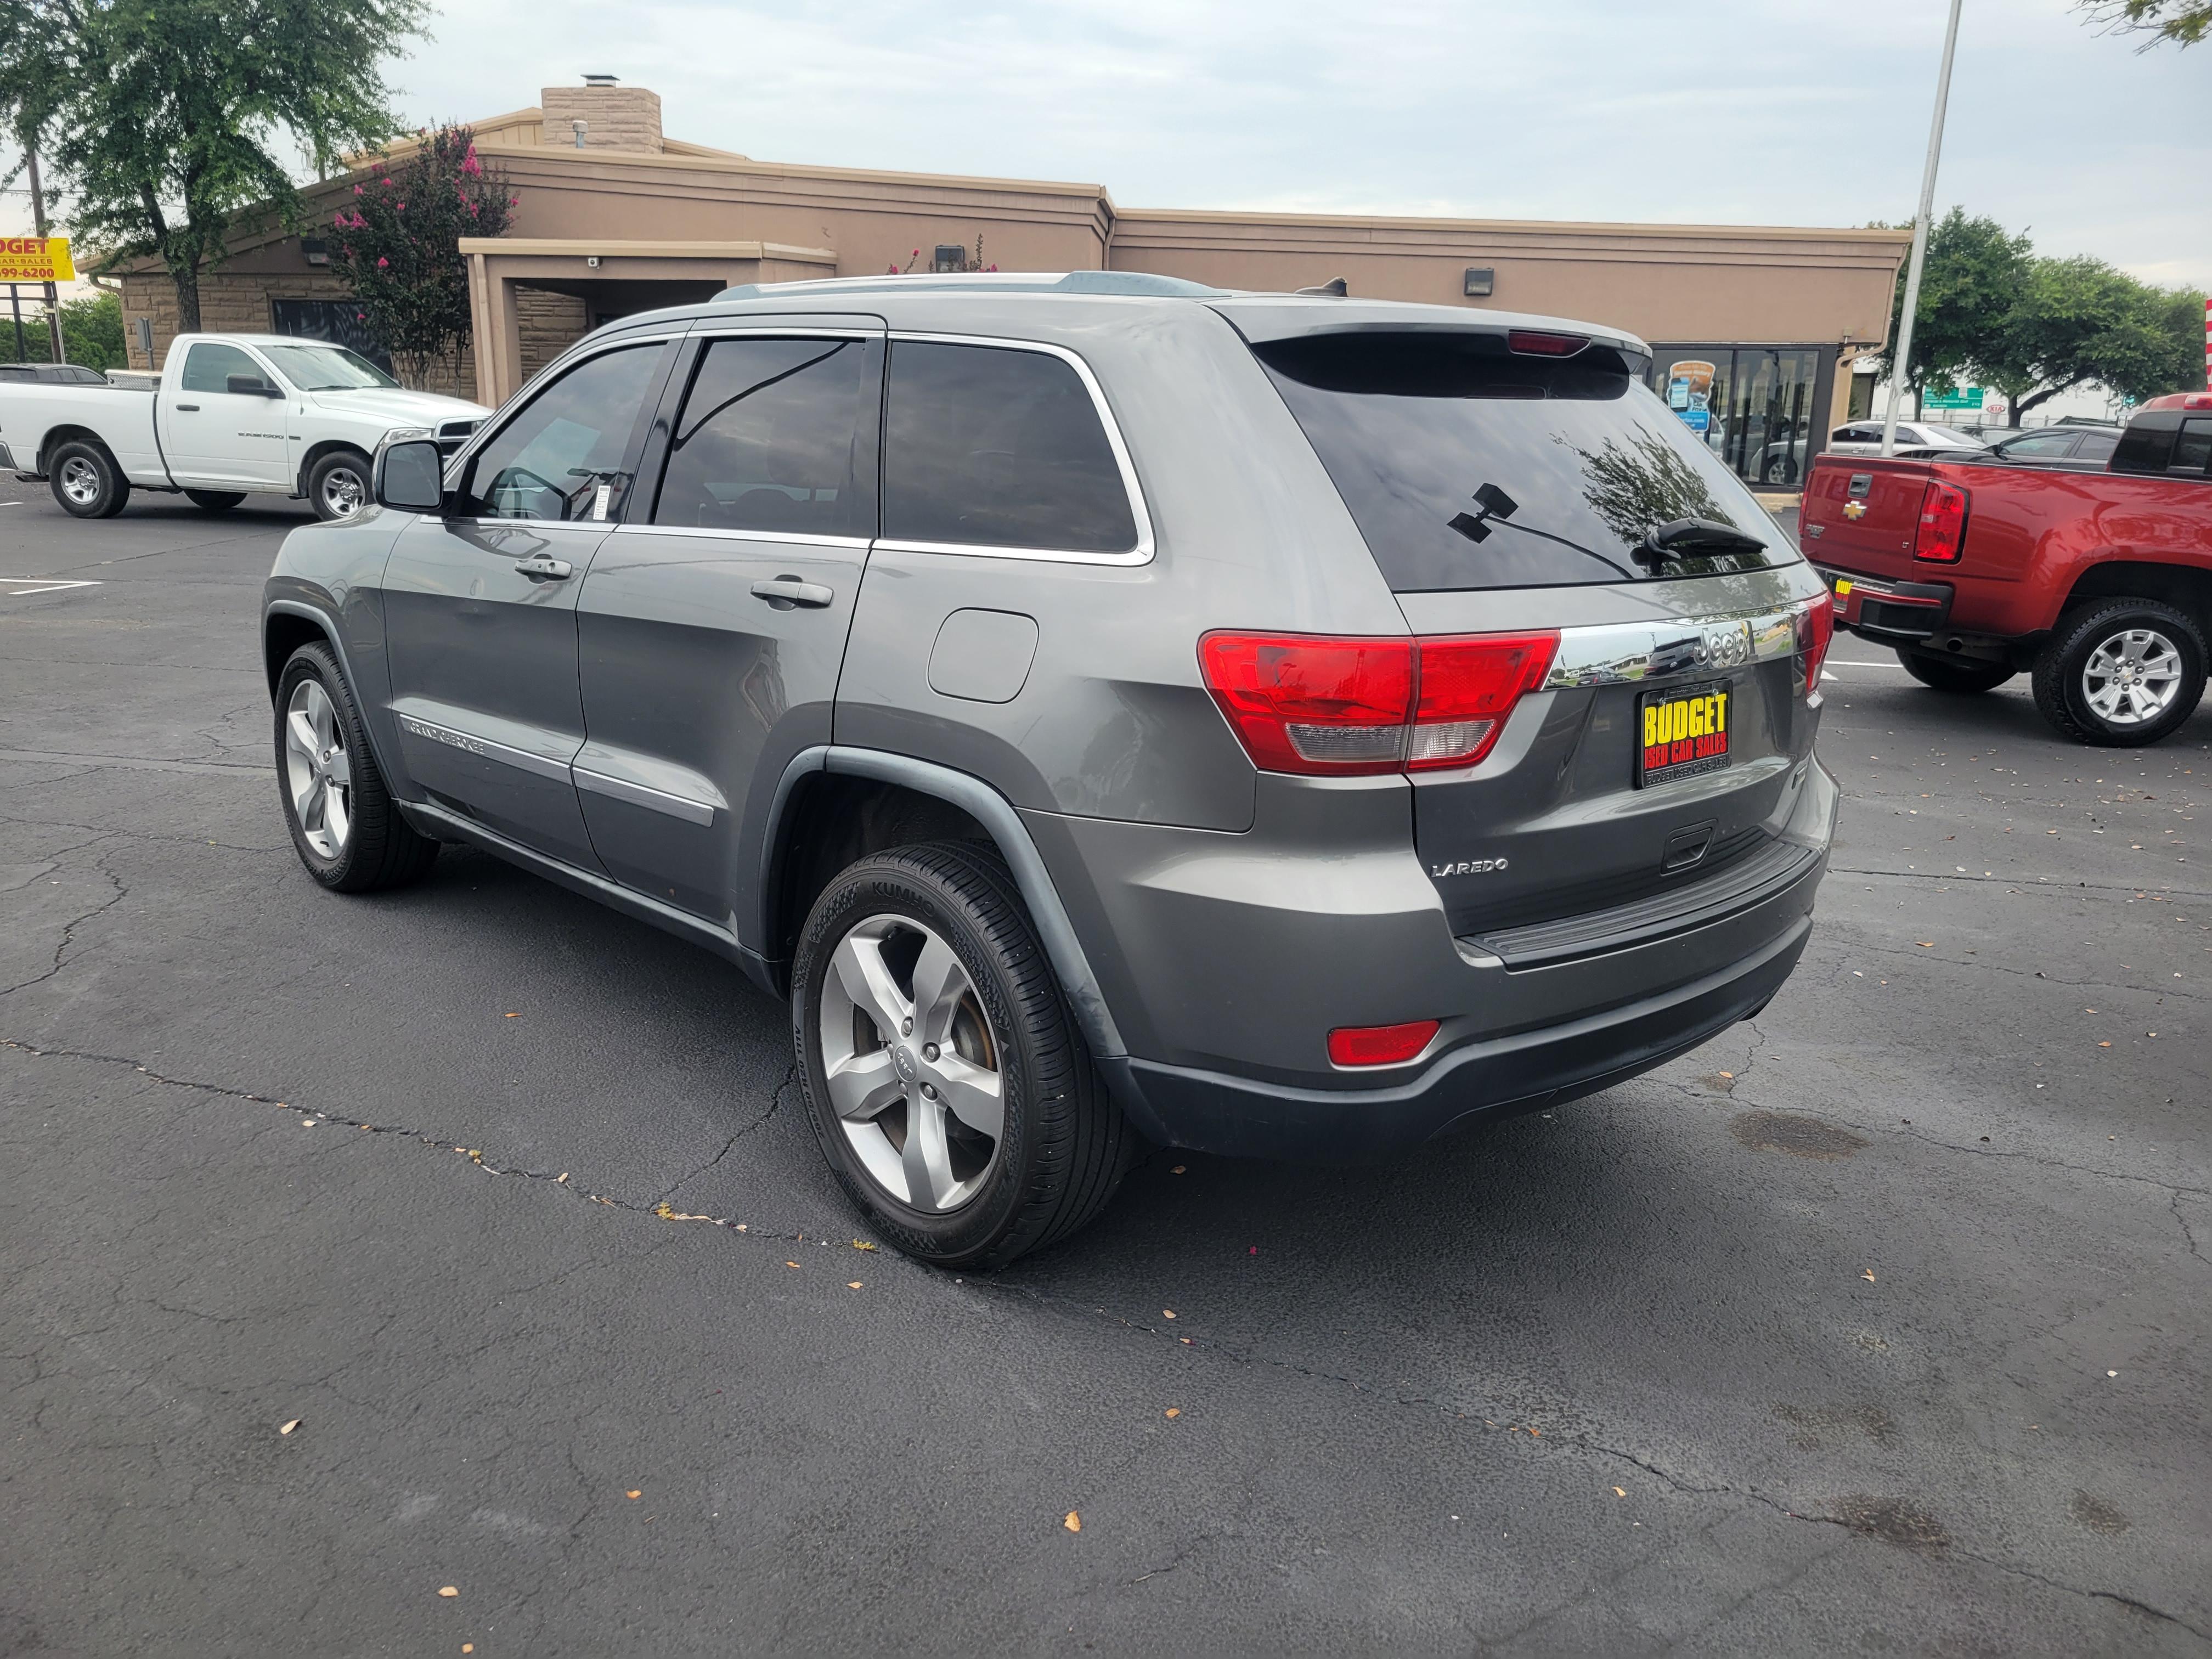 used vehicle - SUV JEEP GRAND CHEROKEE 2012